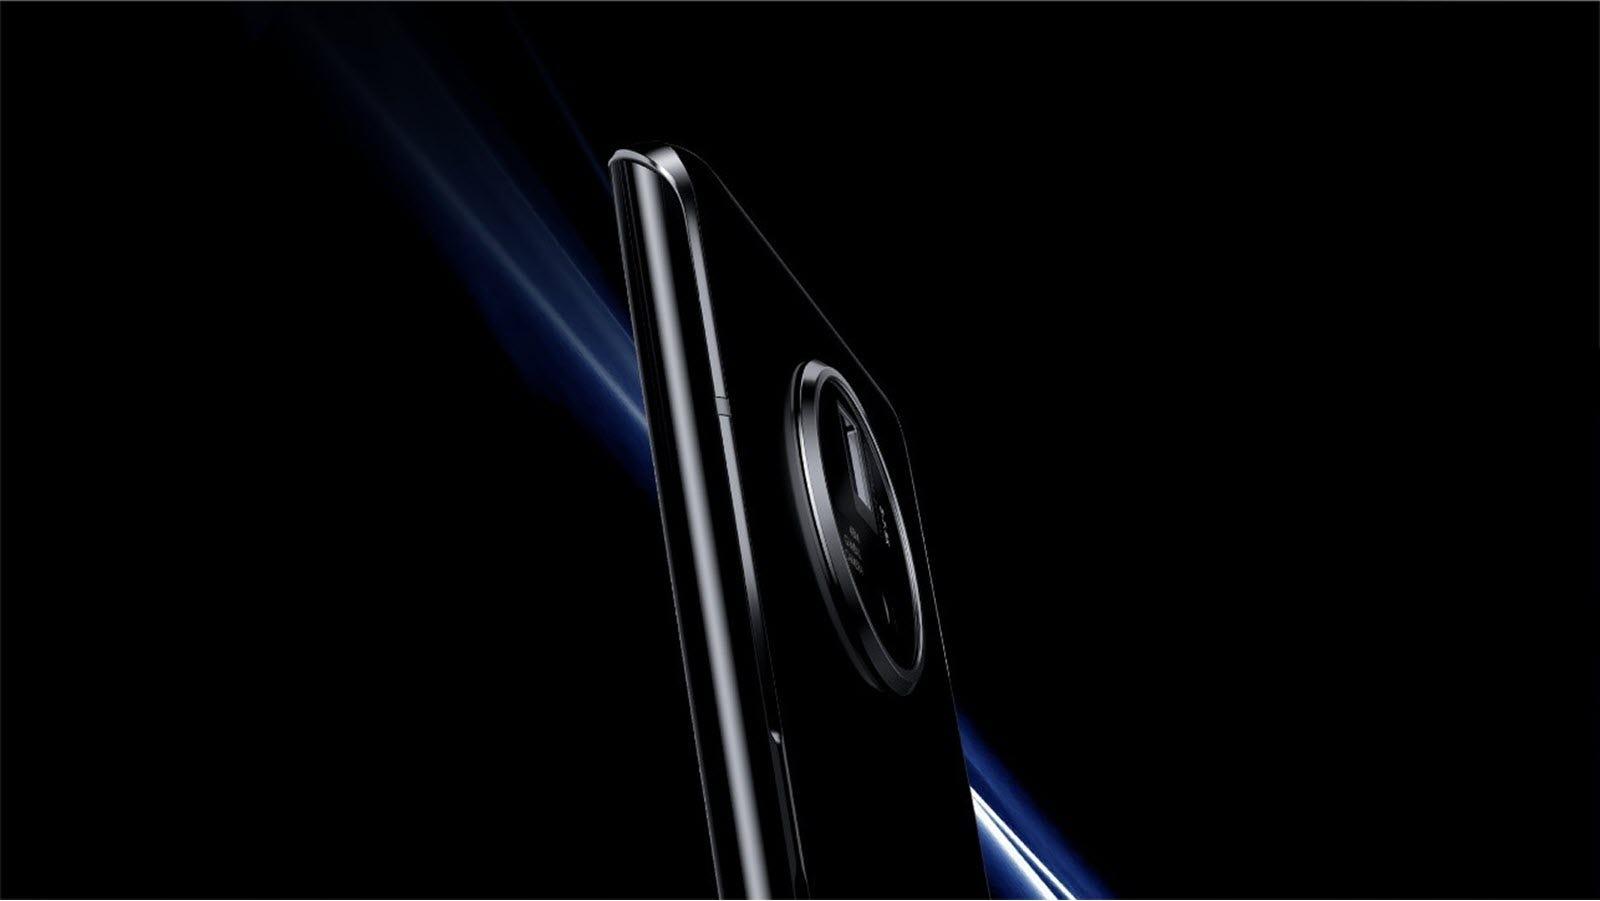 A close-up of the Vivo's 48 megapixel camera.